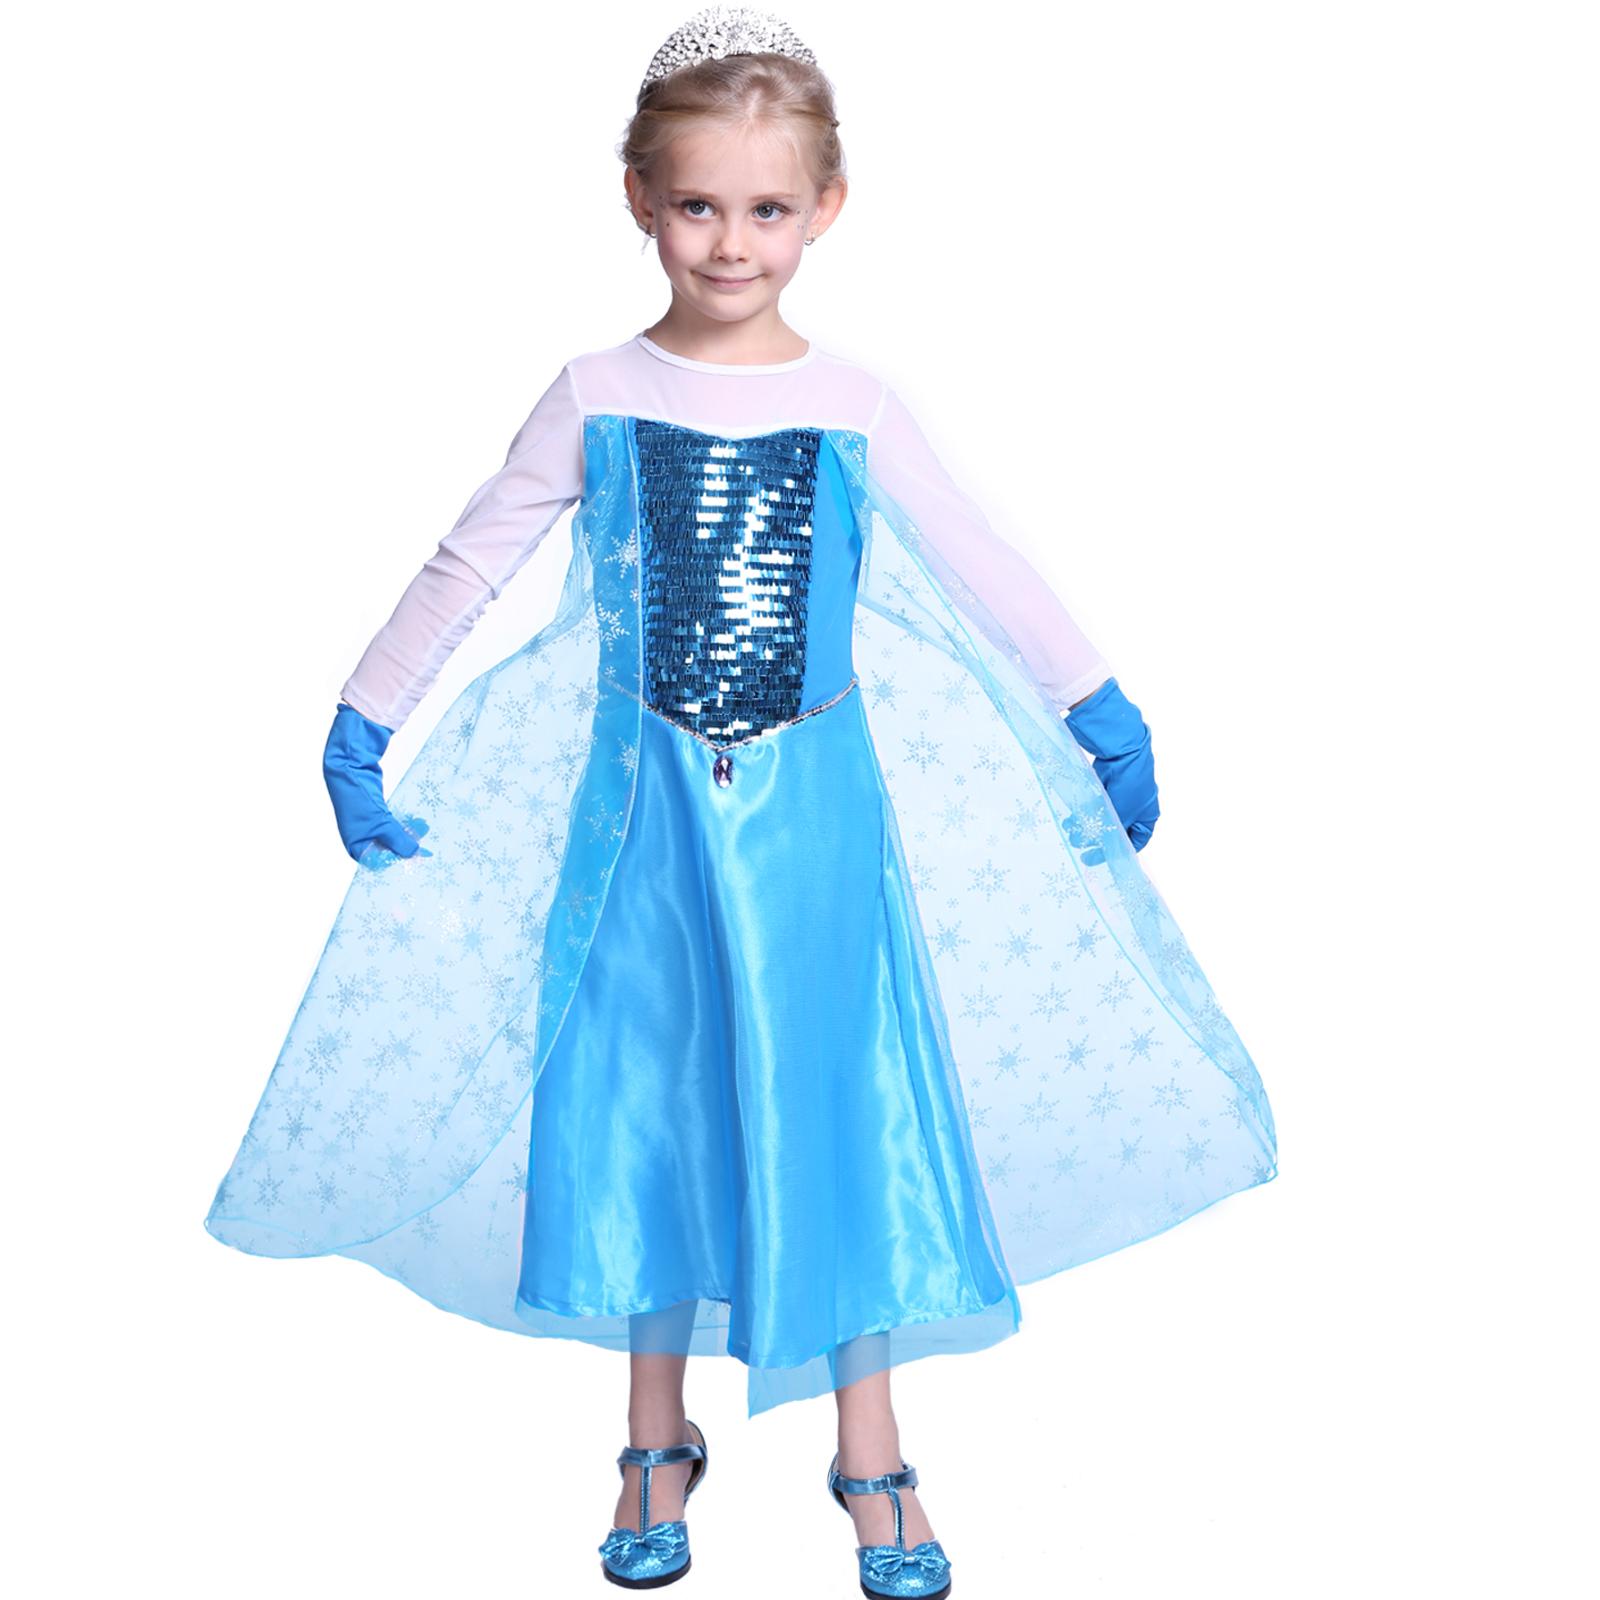 Kids Girls Queen Frozen Elsa Anna Costume Christmas Cosplay Party ...